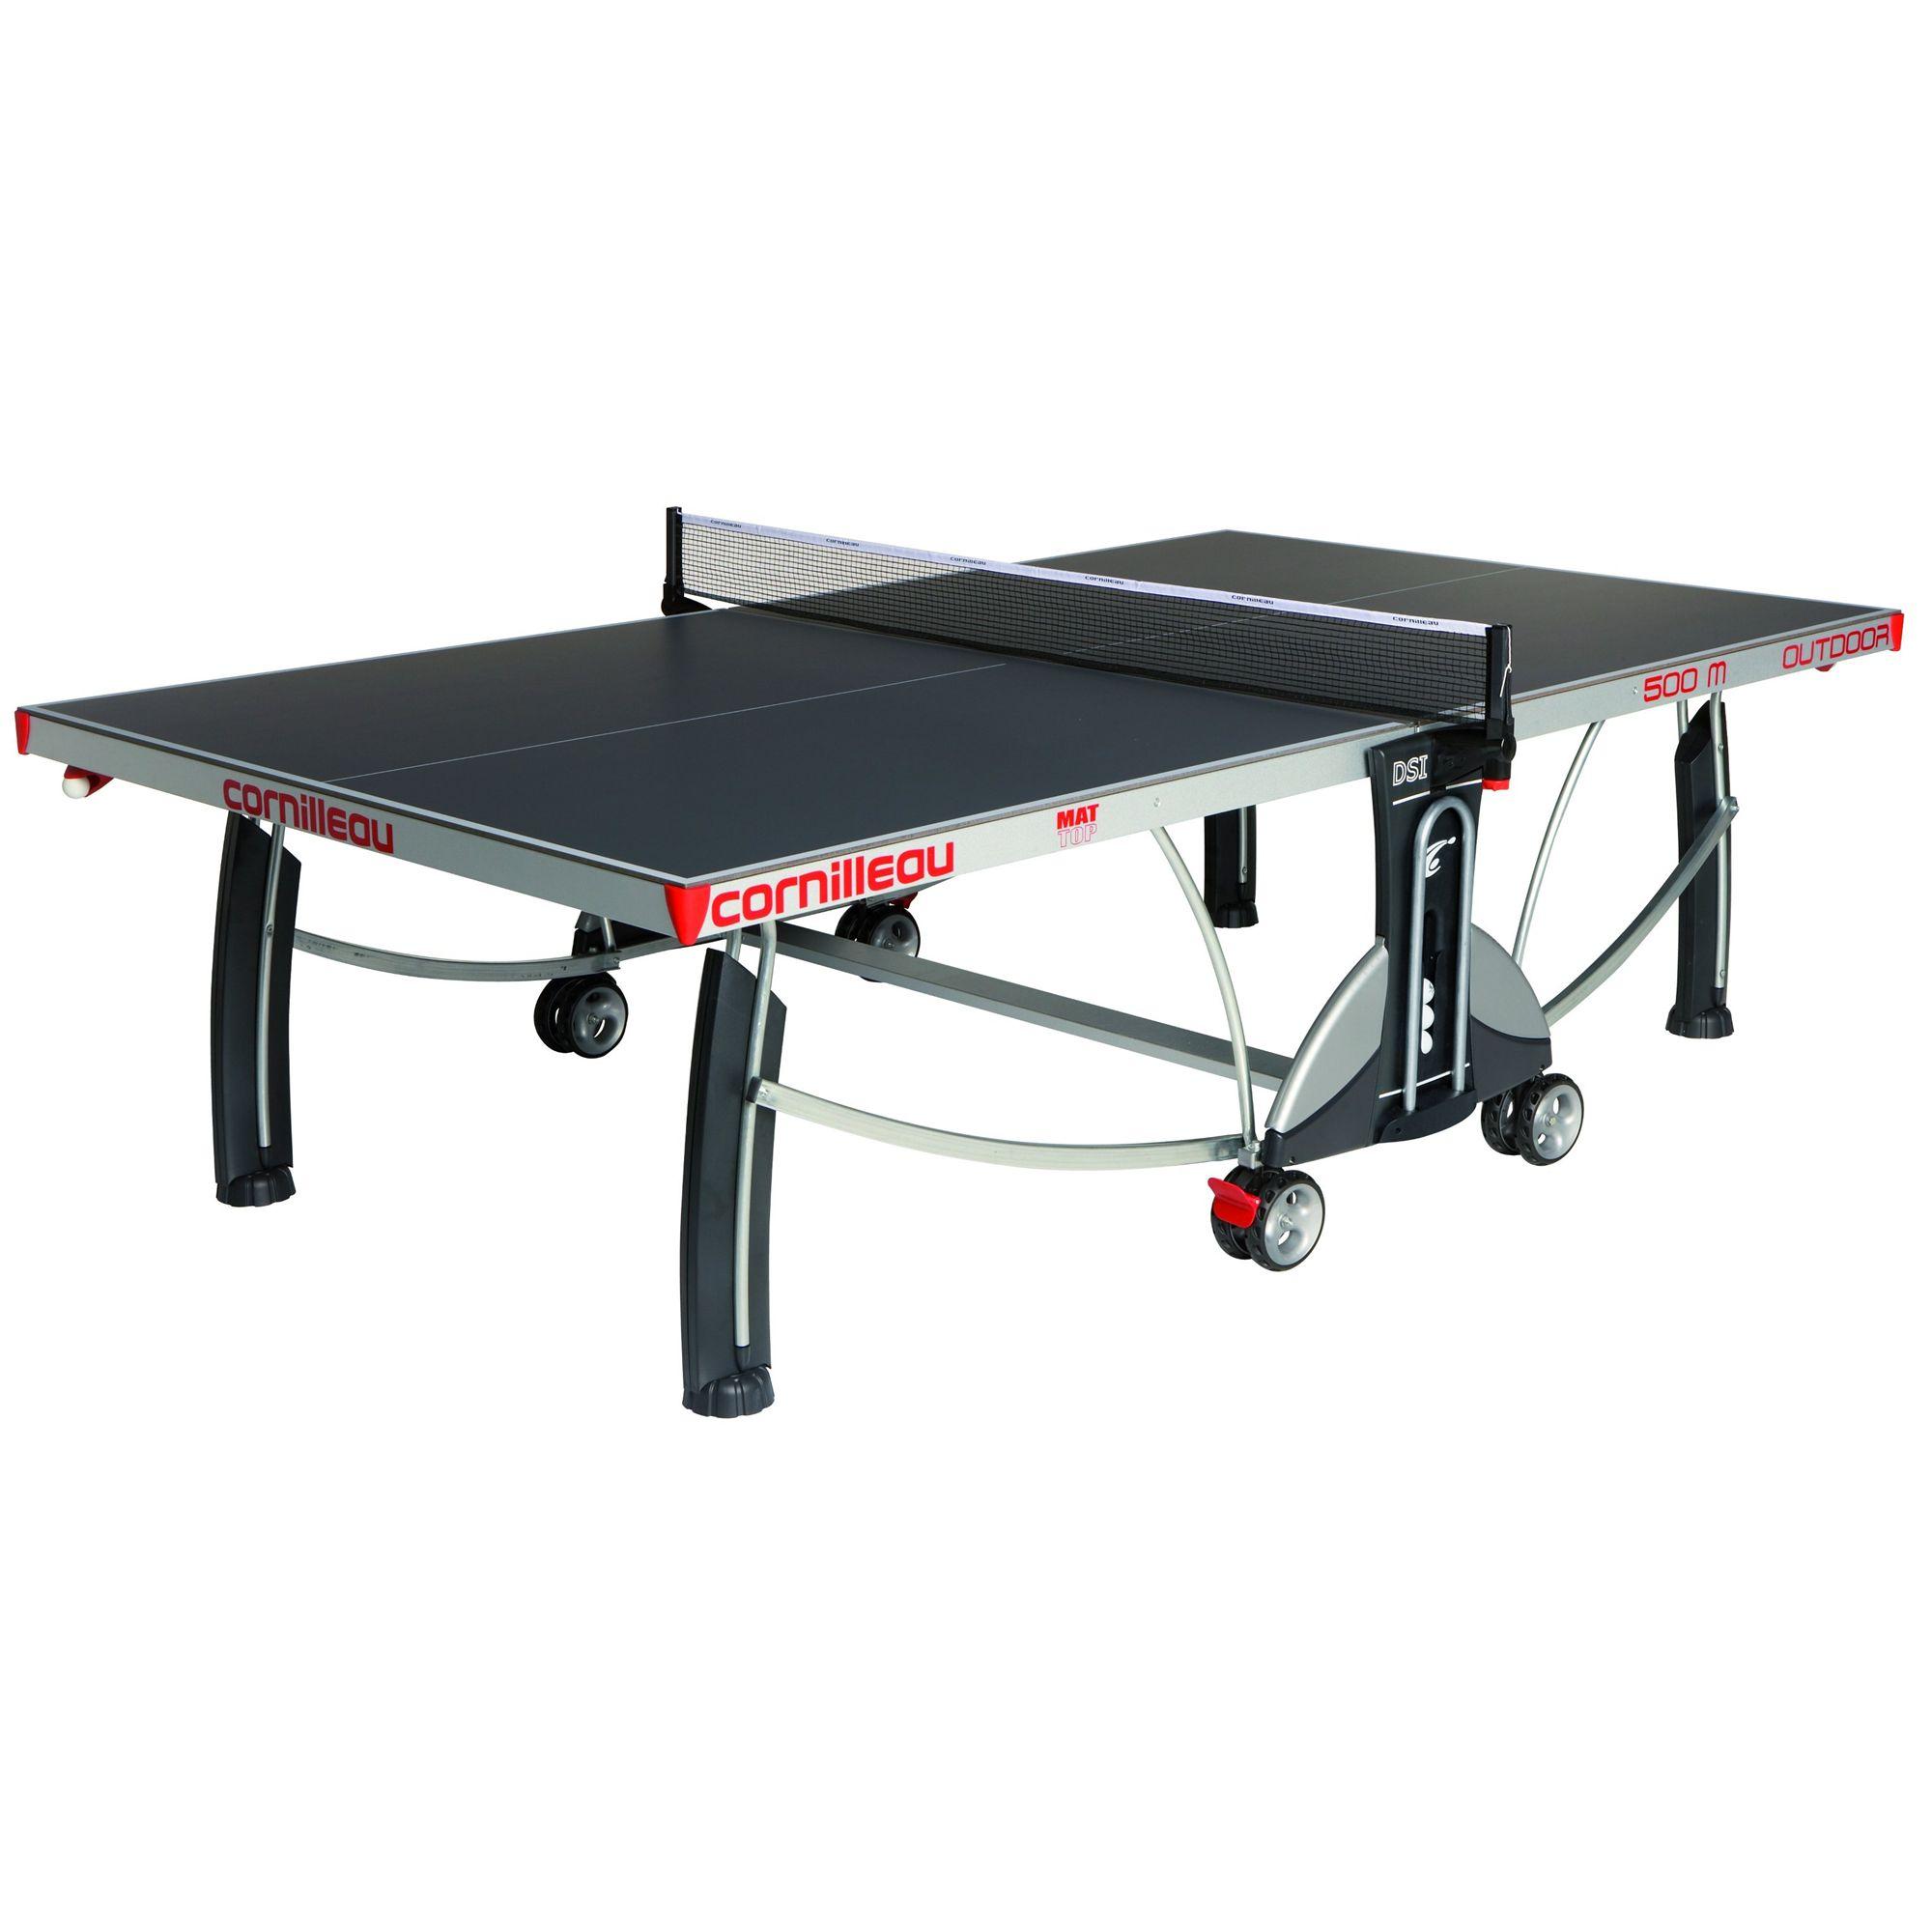 Cornilleau Sport 500M Rollaway 7mm Outdoor Table Tennis Table